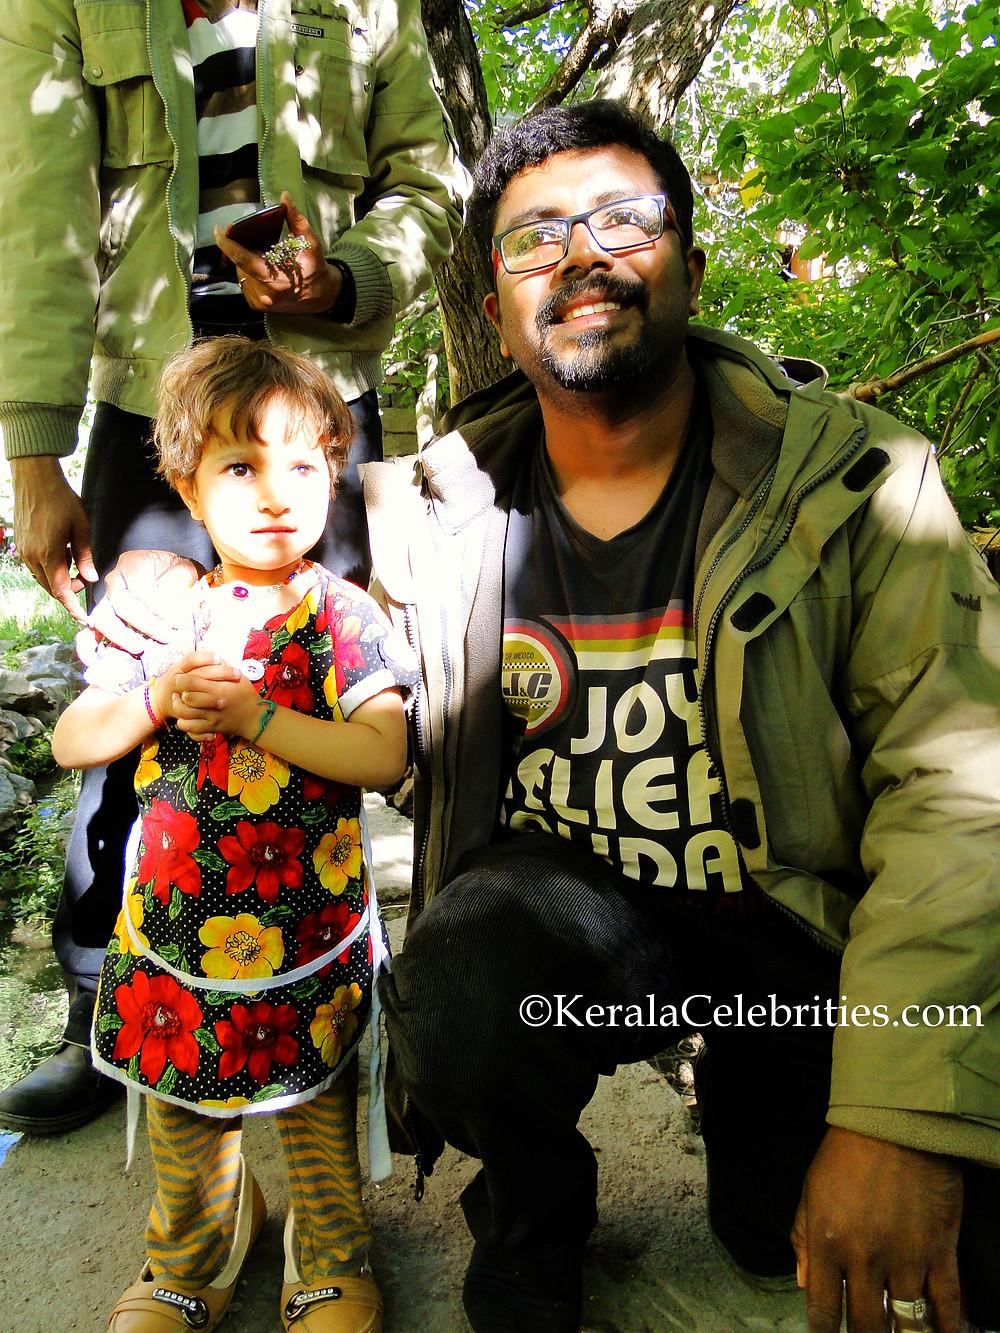 LibinsworlD with Turtuk Village kid